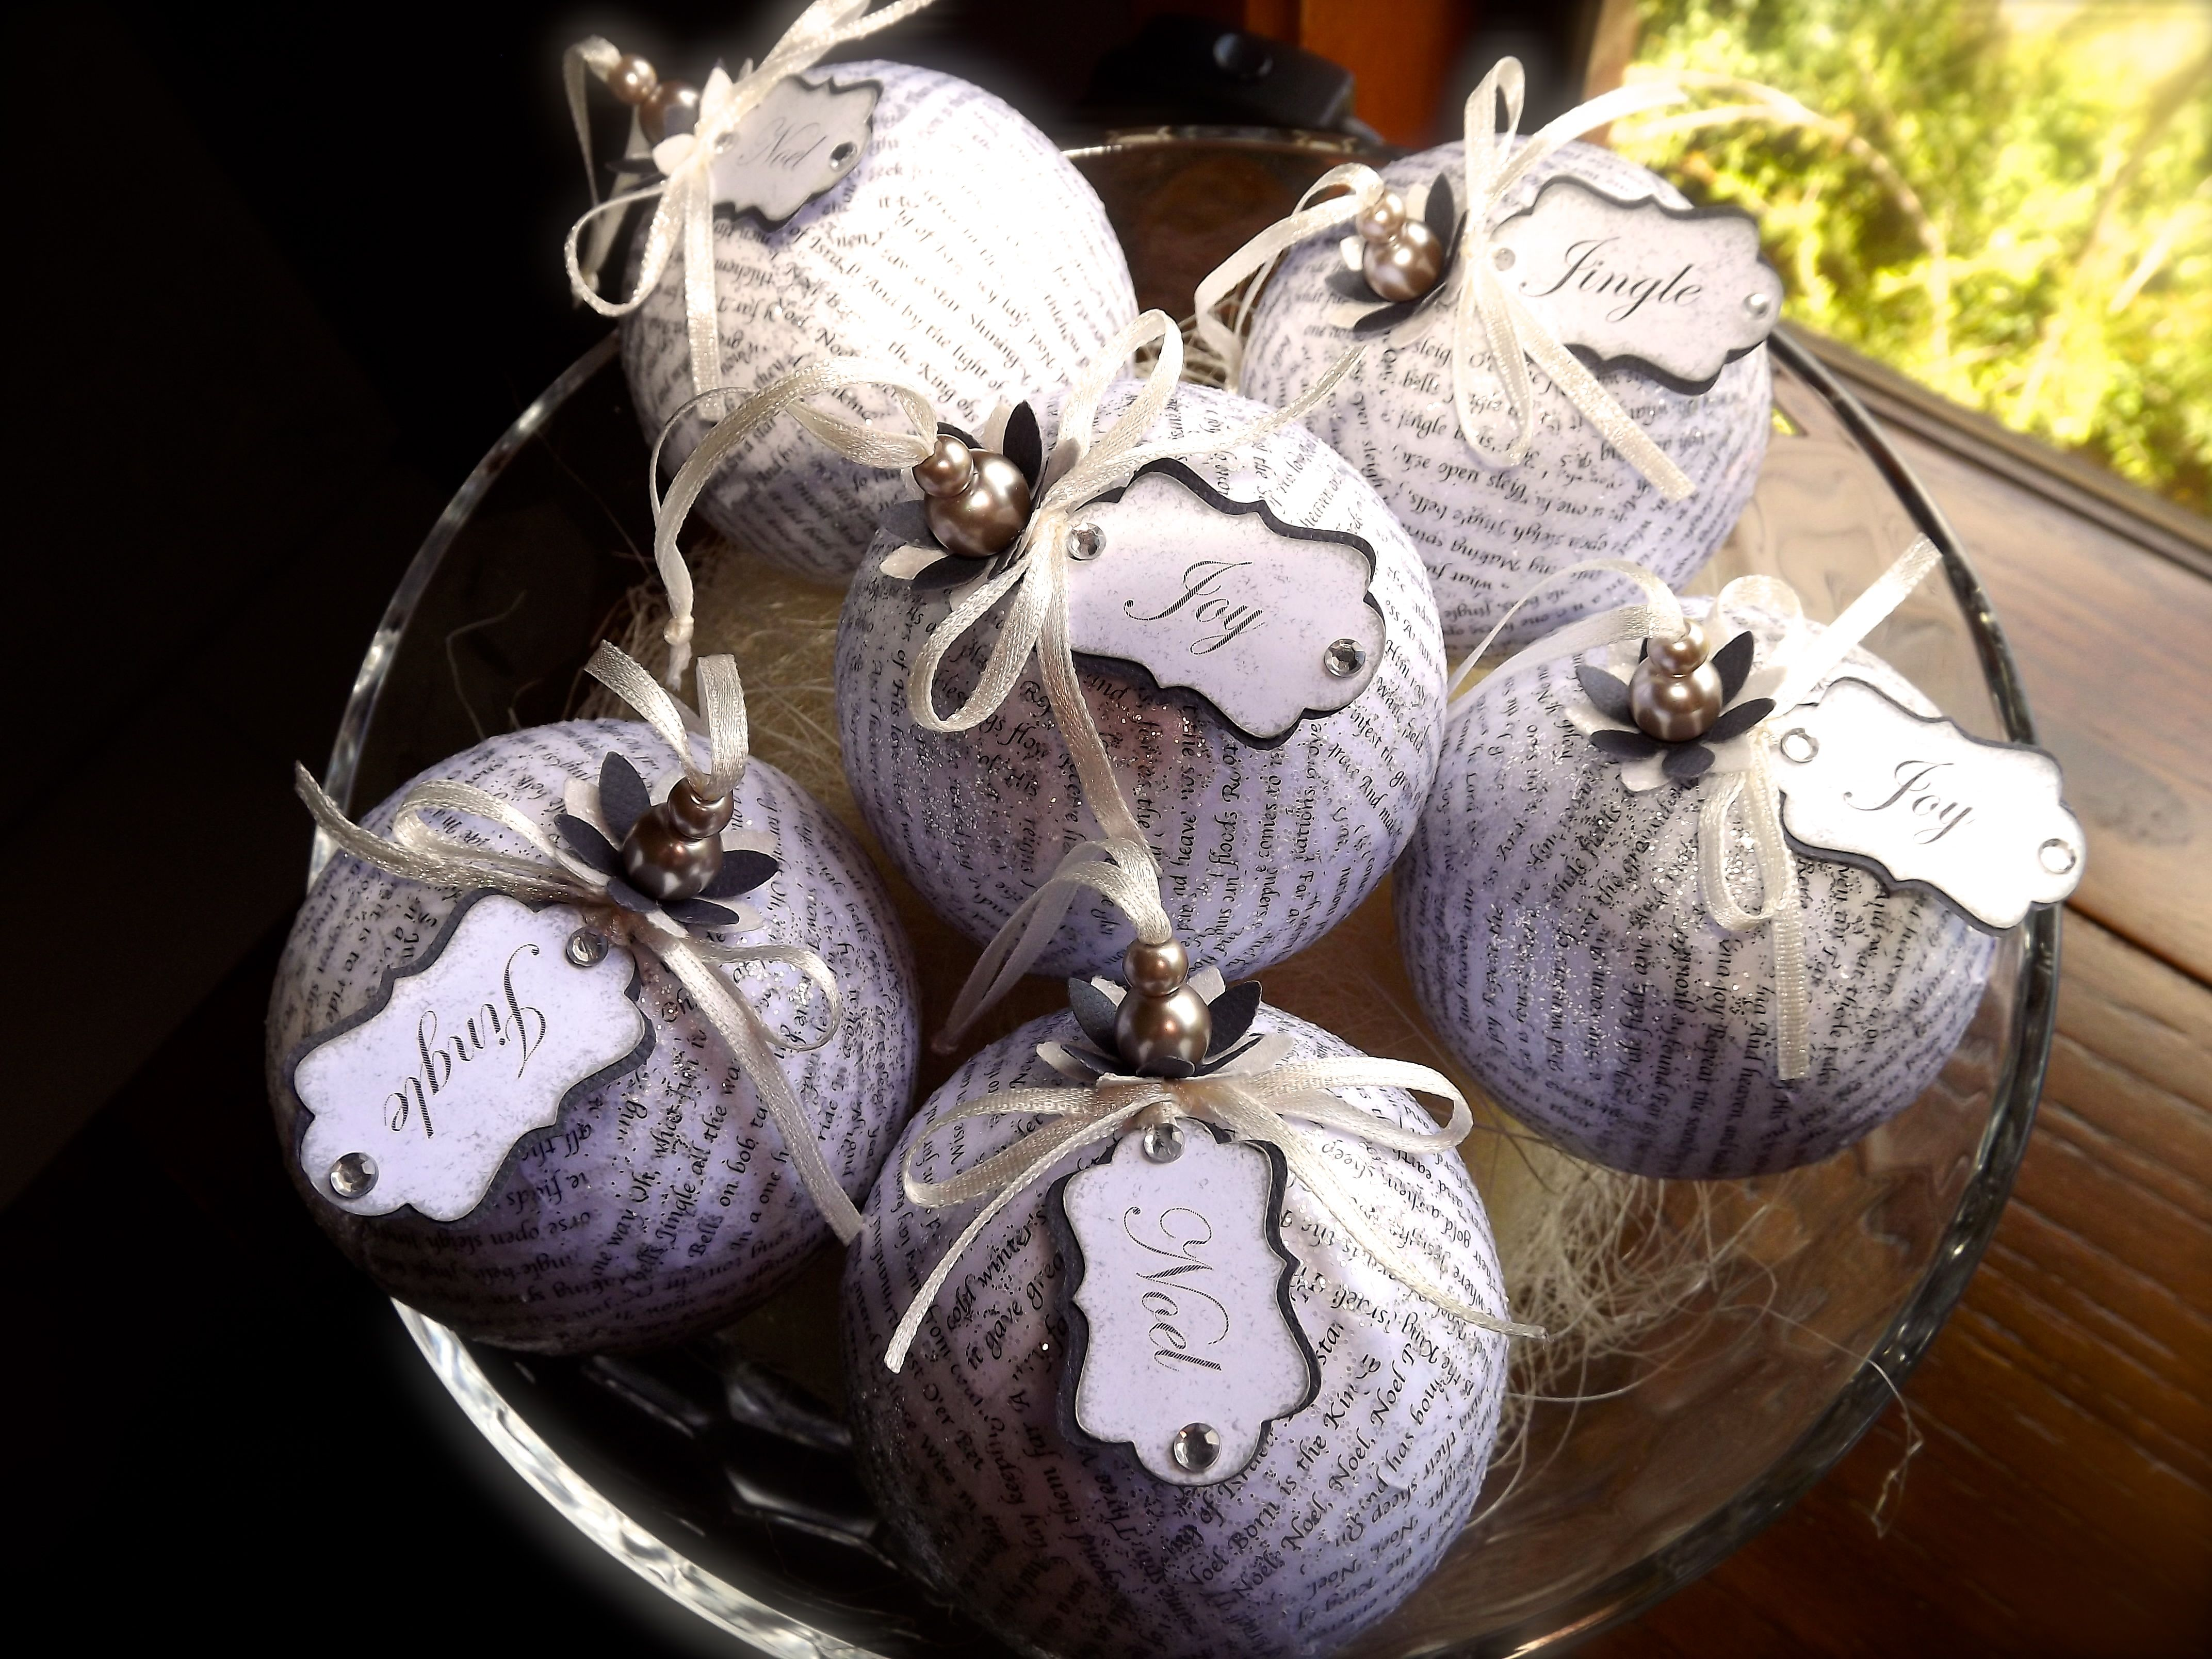 Christmas decoration ornament featuring decoupaged Christmas carol